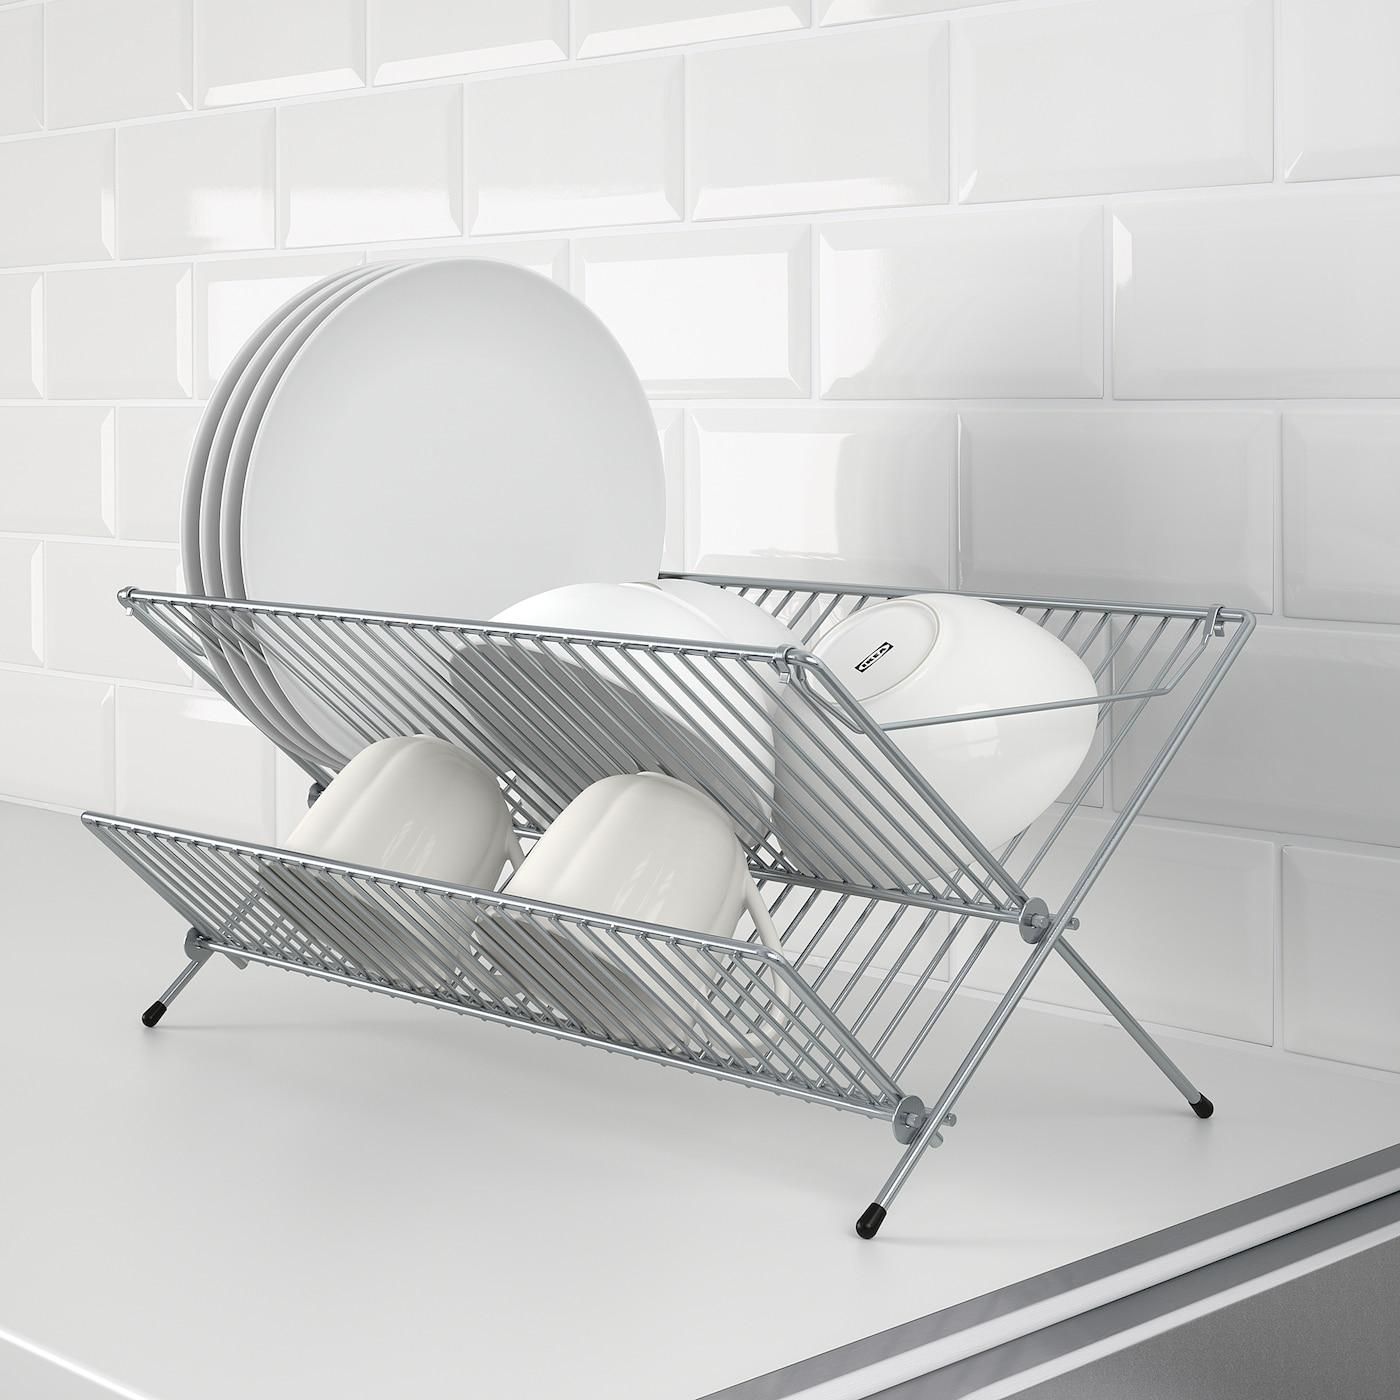 Kvot Abtropfgestell Verzinkt Ikea Deutschland